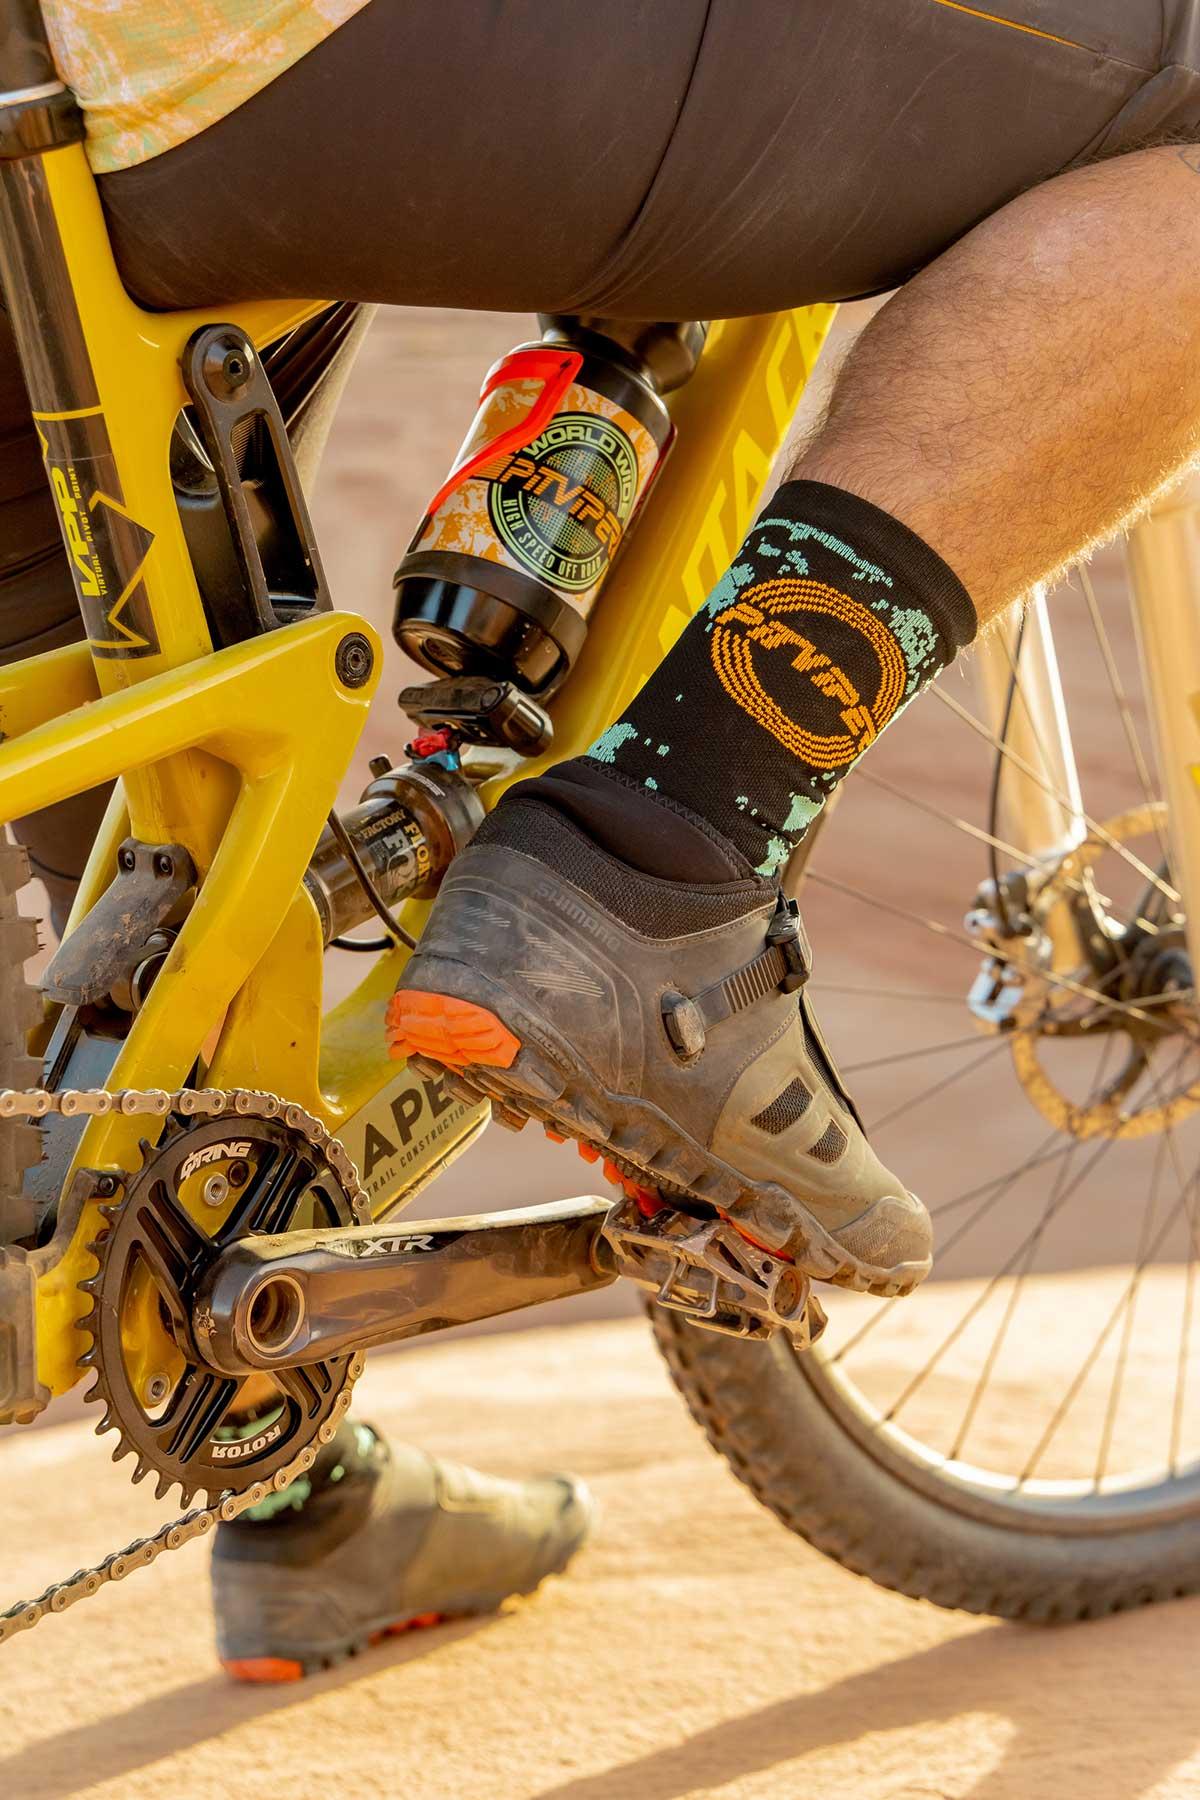 pit viper mtb socks water bottle